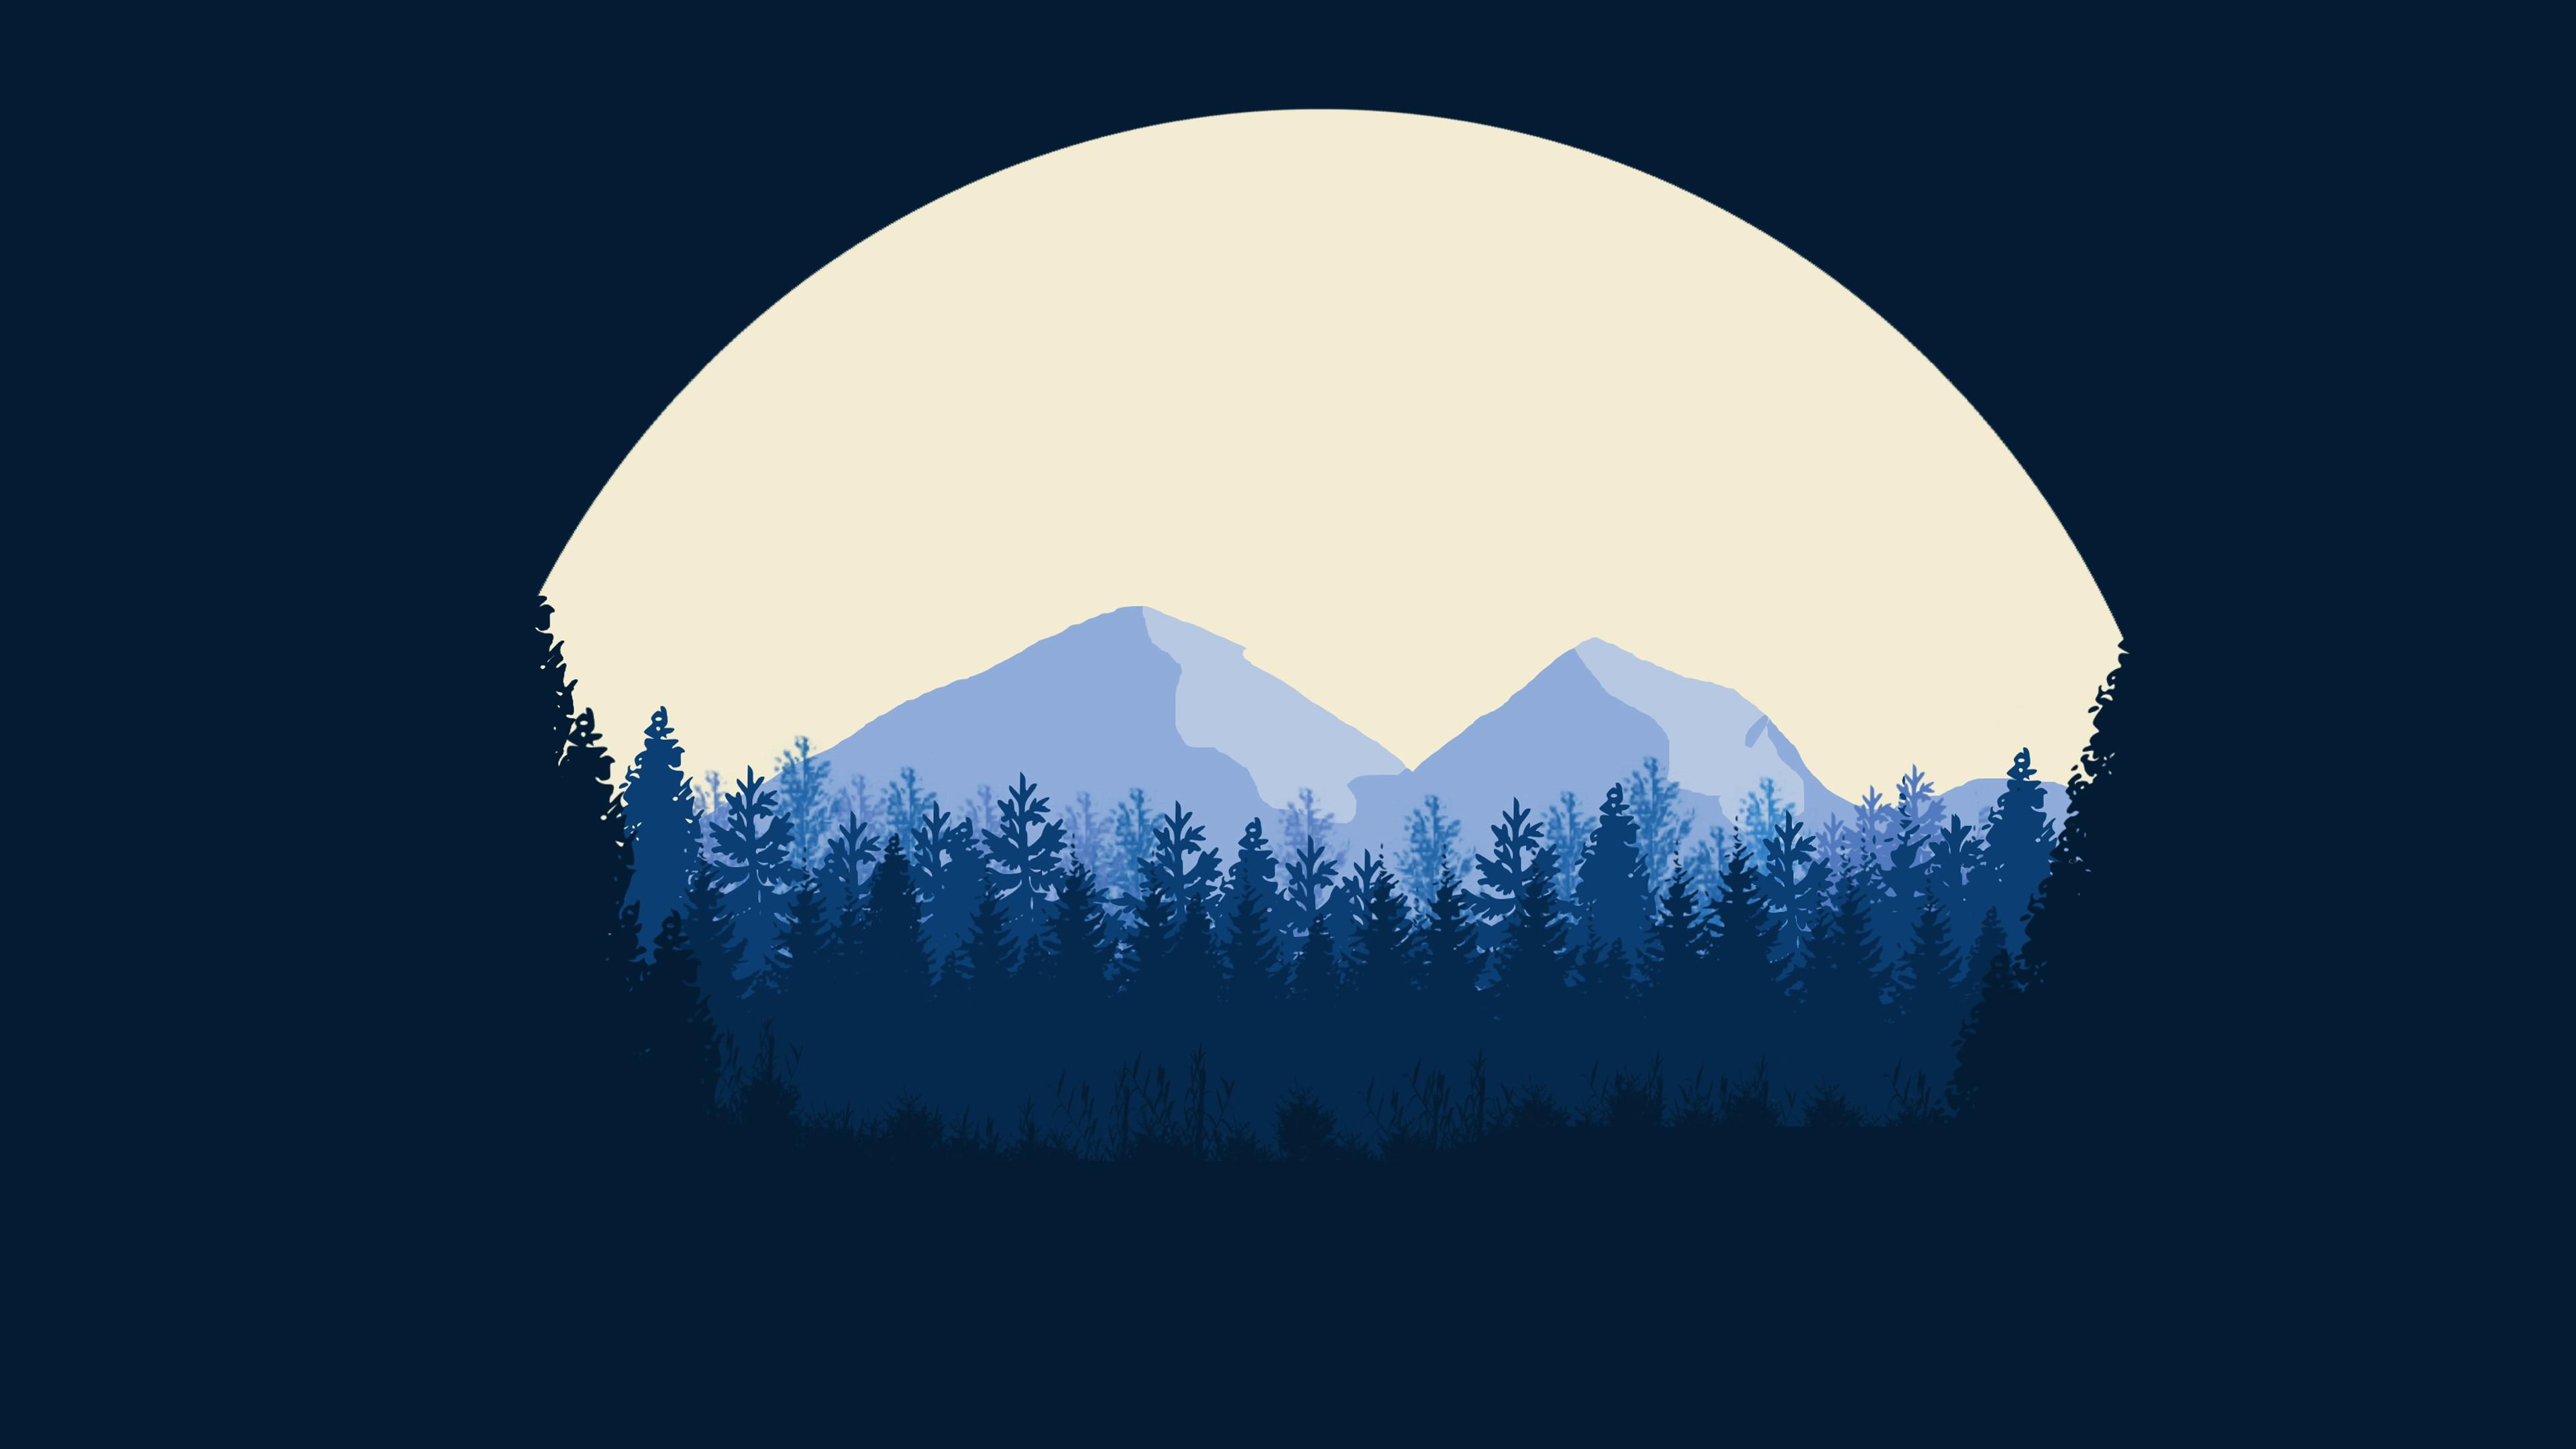 Animated Desktop Wallpaper For Windows 7 Free Download Moon Backgrounds Free Download Pixelstalk Net